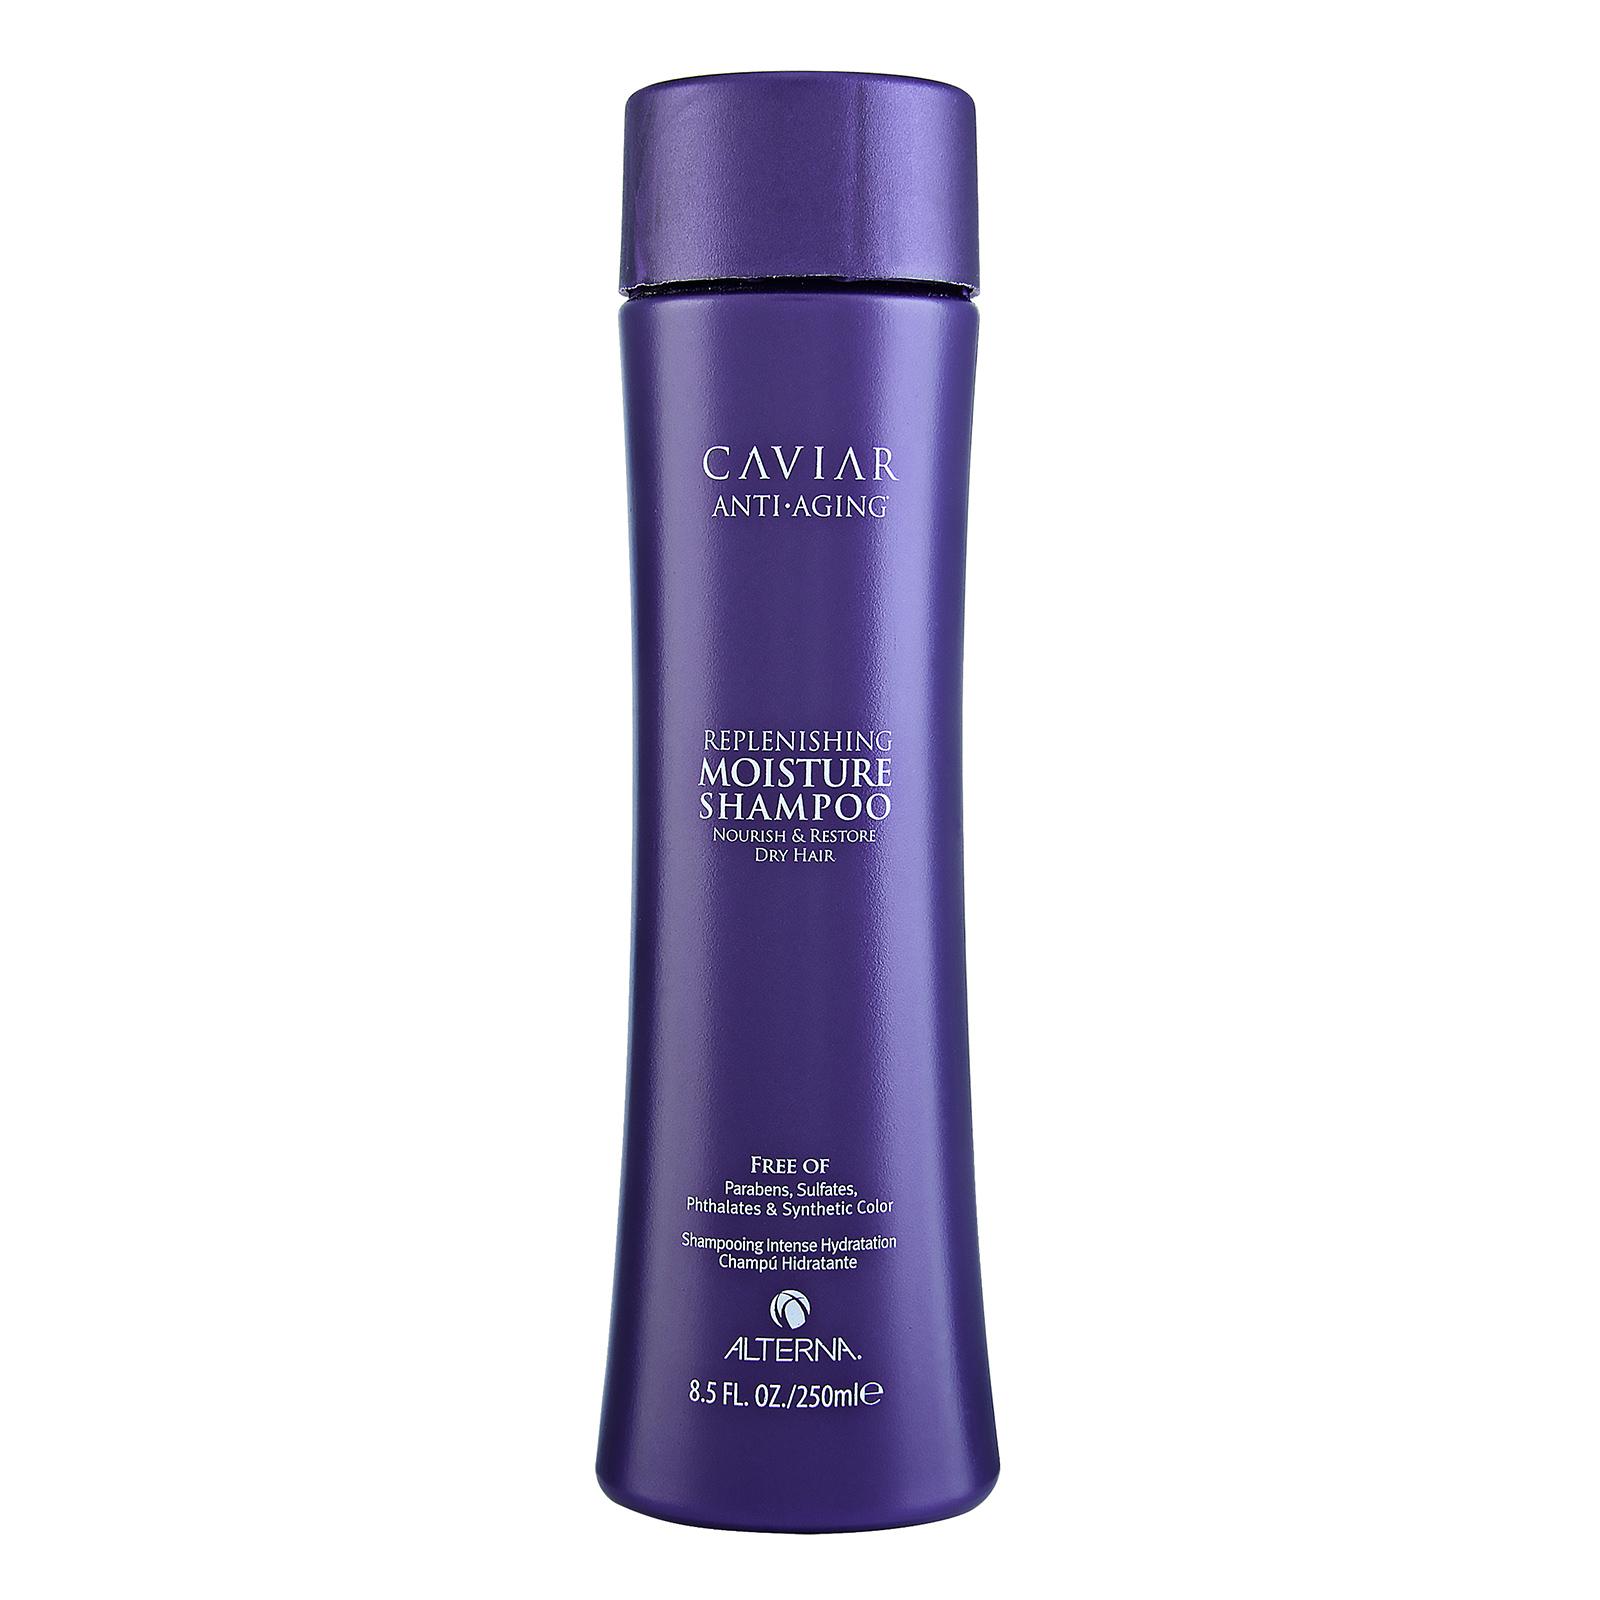 Alterna Haircare Caviar  Anti-Aging Replenishing Moisture Shampoo (Dry Hair) 8.5oz, 250ml